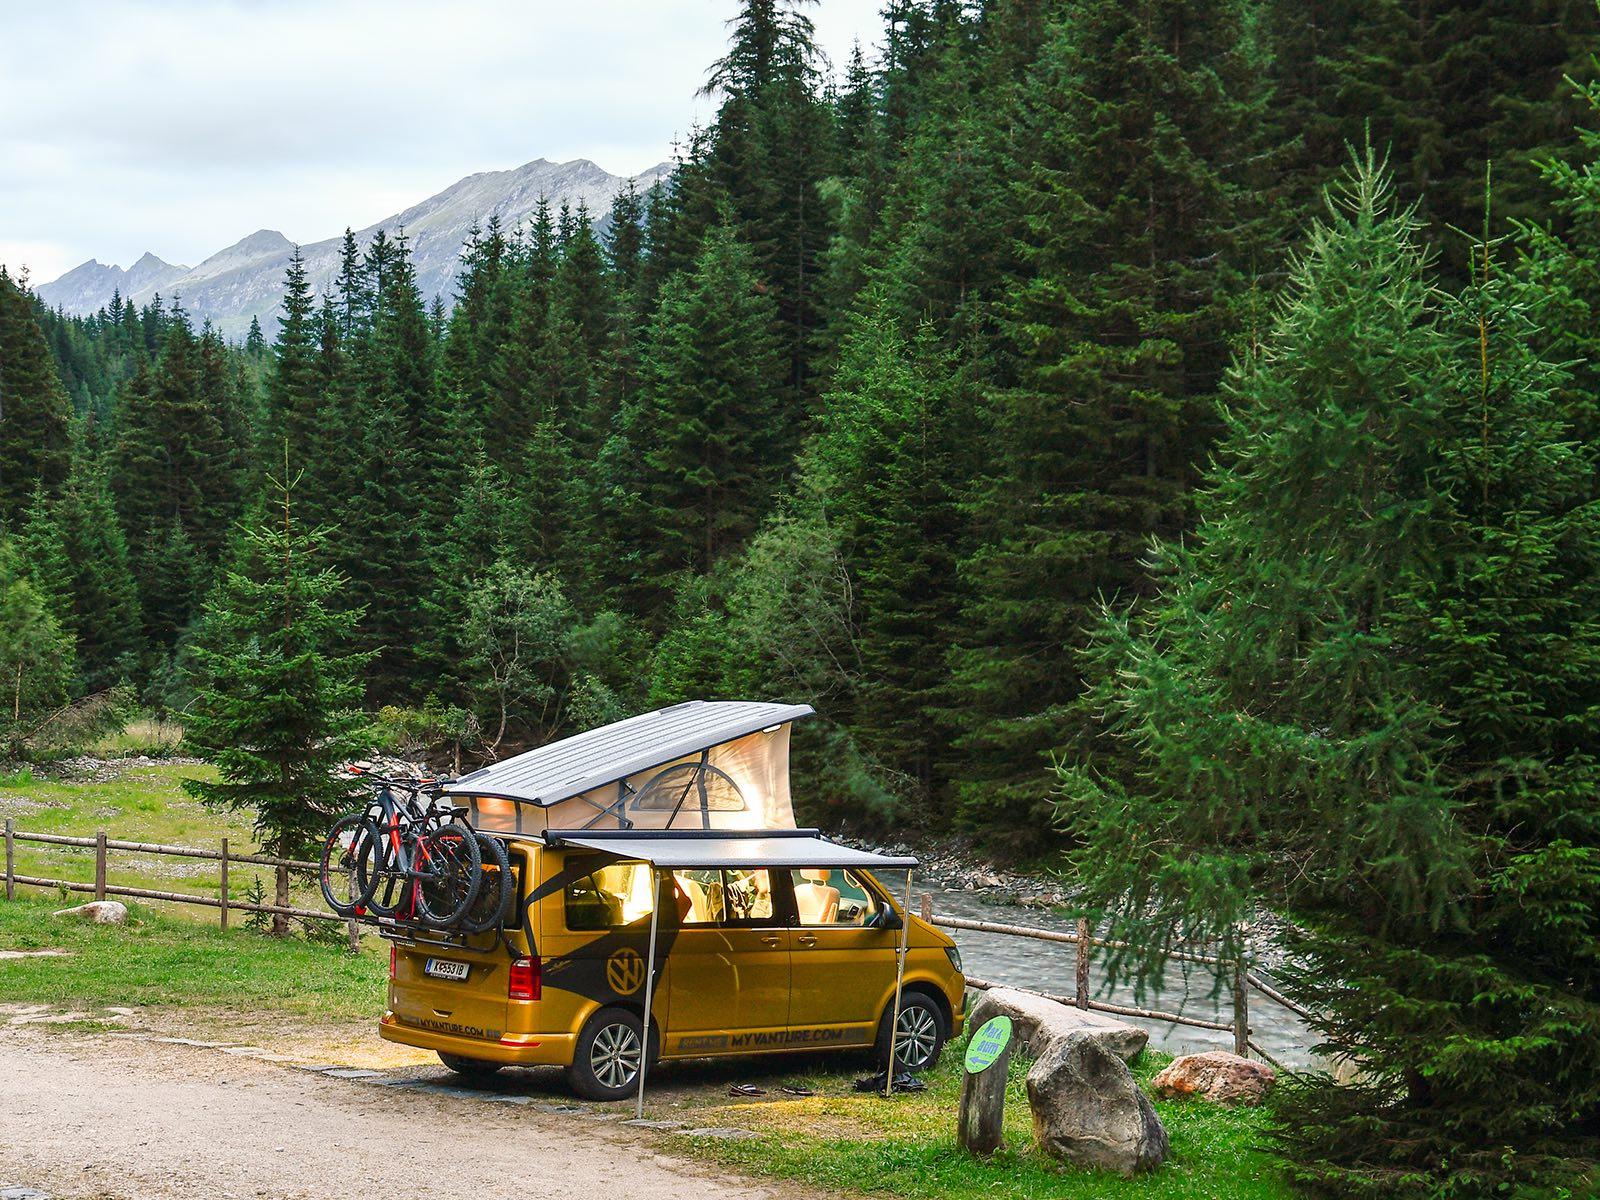 Van im Campingmodus